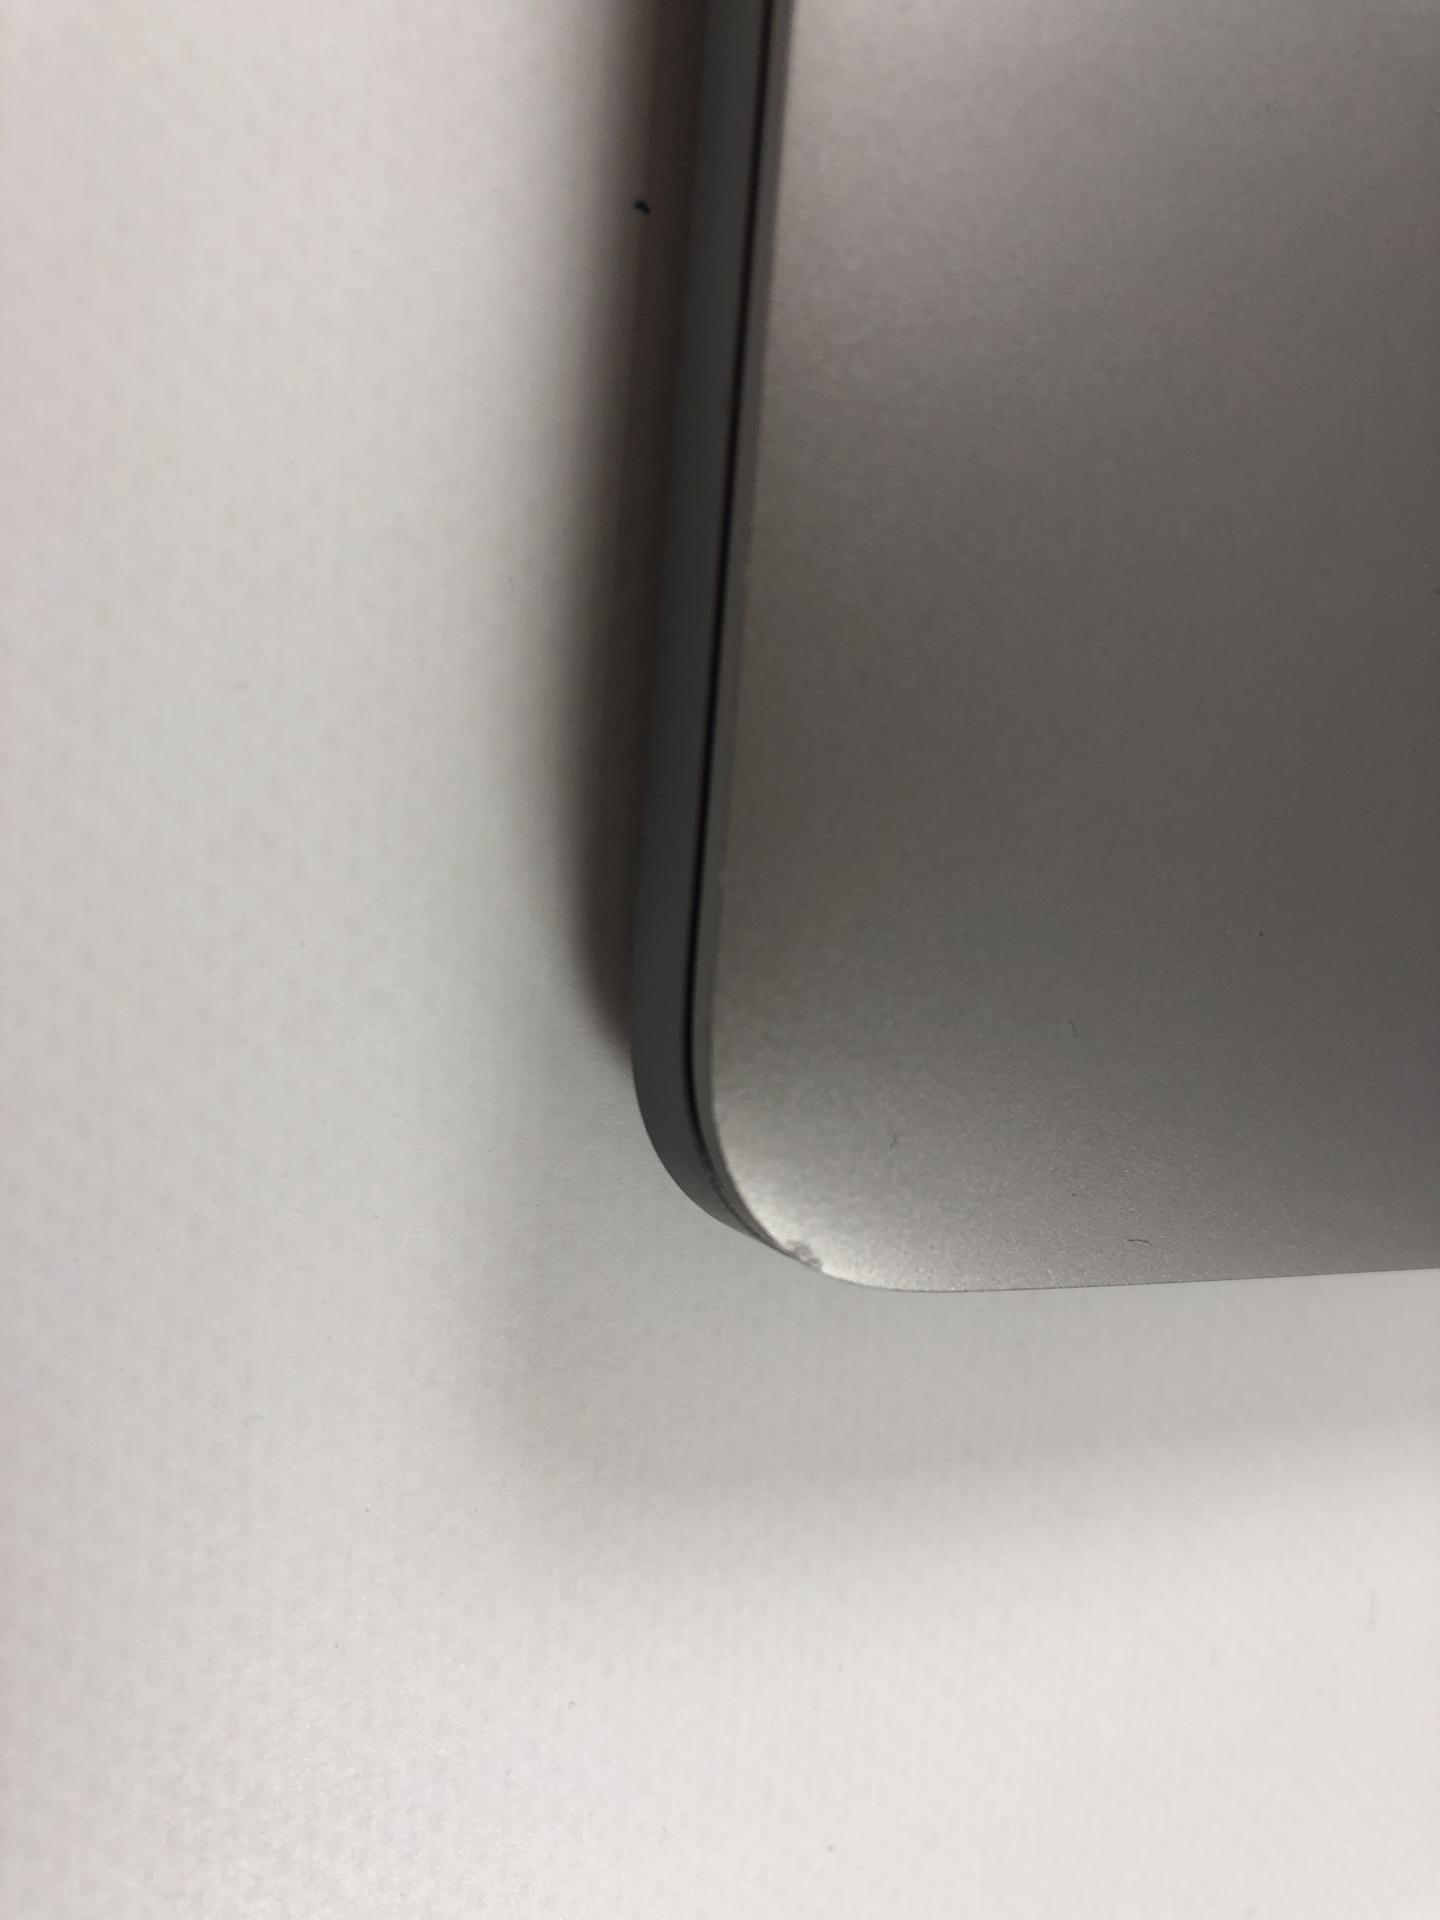 "MacBook Pro 15"" Touch Bar Late 2016 (Intel Quad-Core i7 2.7 GHz 16 GB RAM 512 GB SSD), Space Gray, Intel Quad-Core i7 2.7 GHz, 16 GB RAM, 512 GB SSD, Kuva 5"